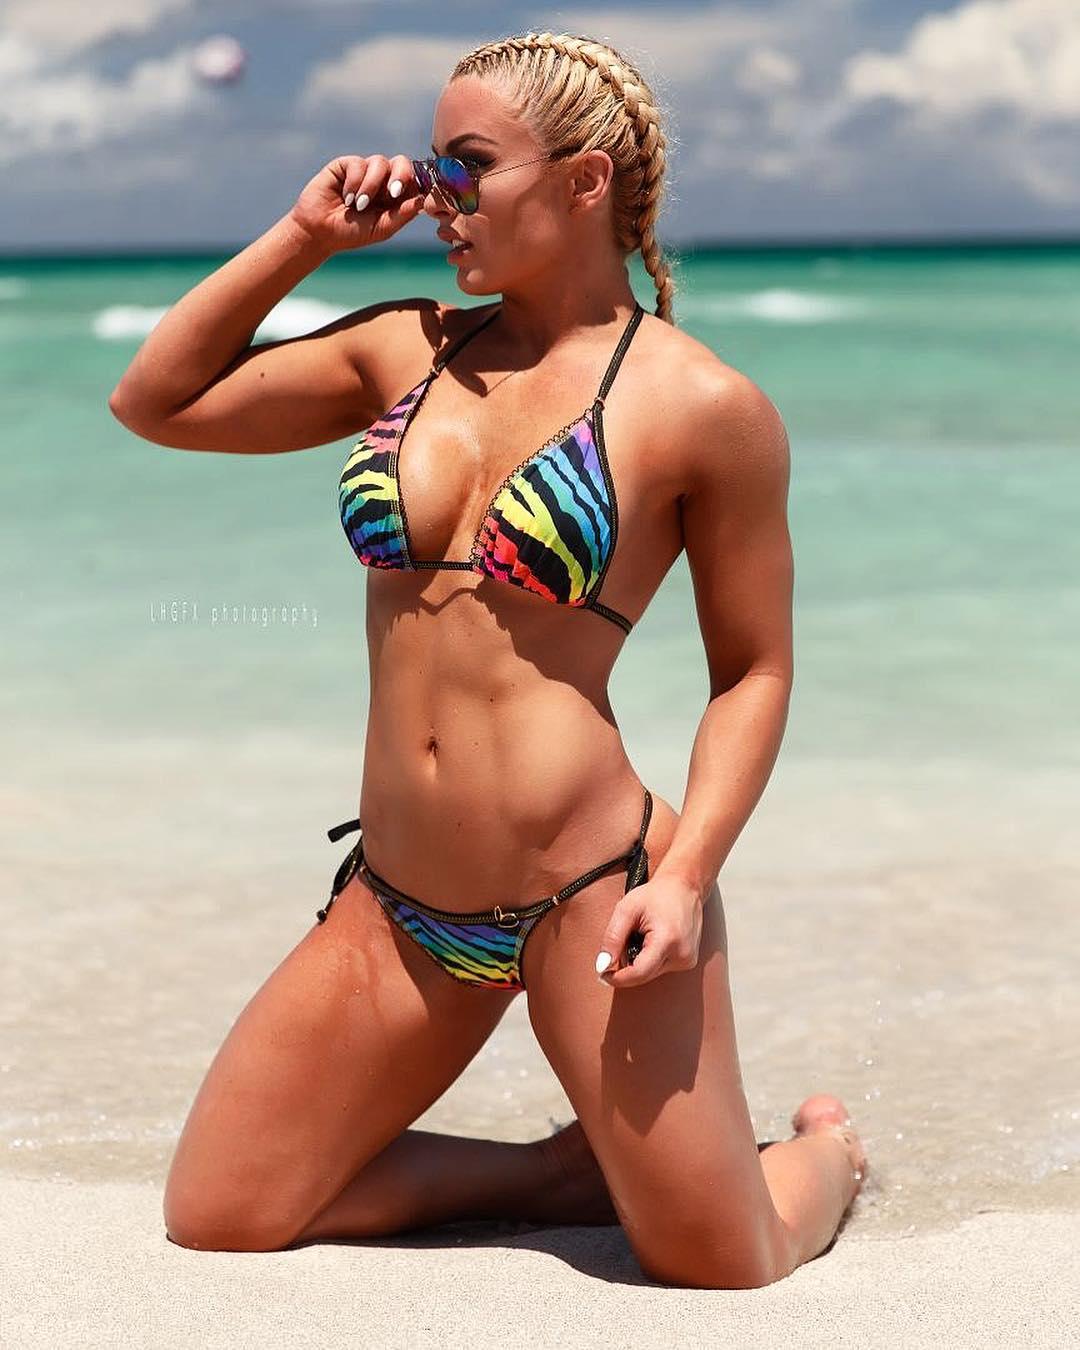 Mandy Rose hot photo